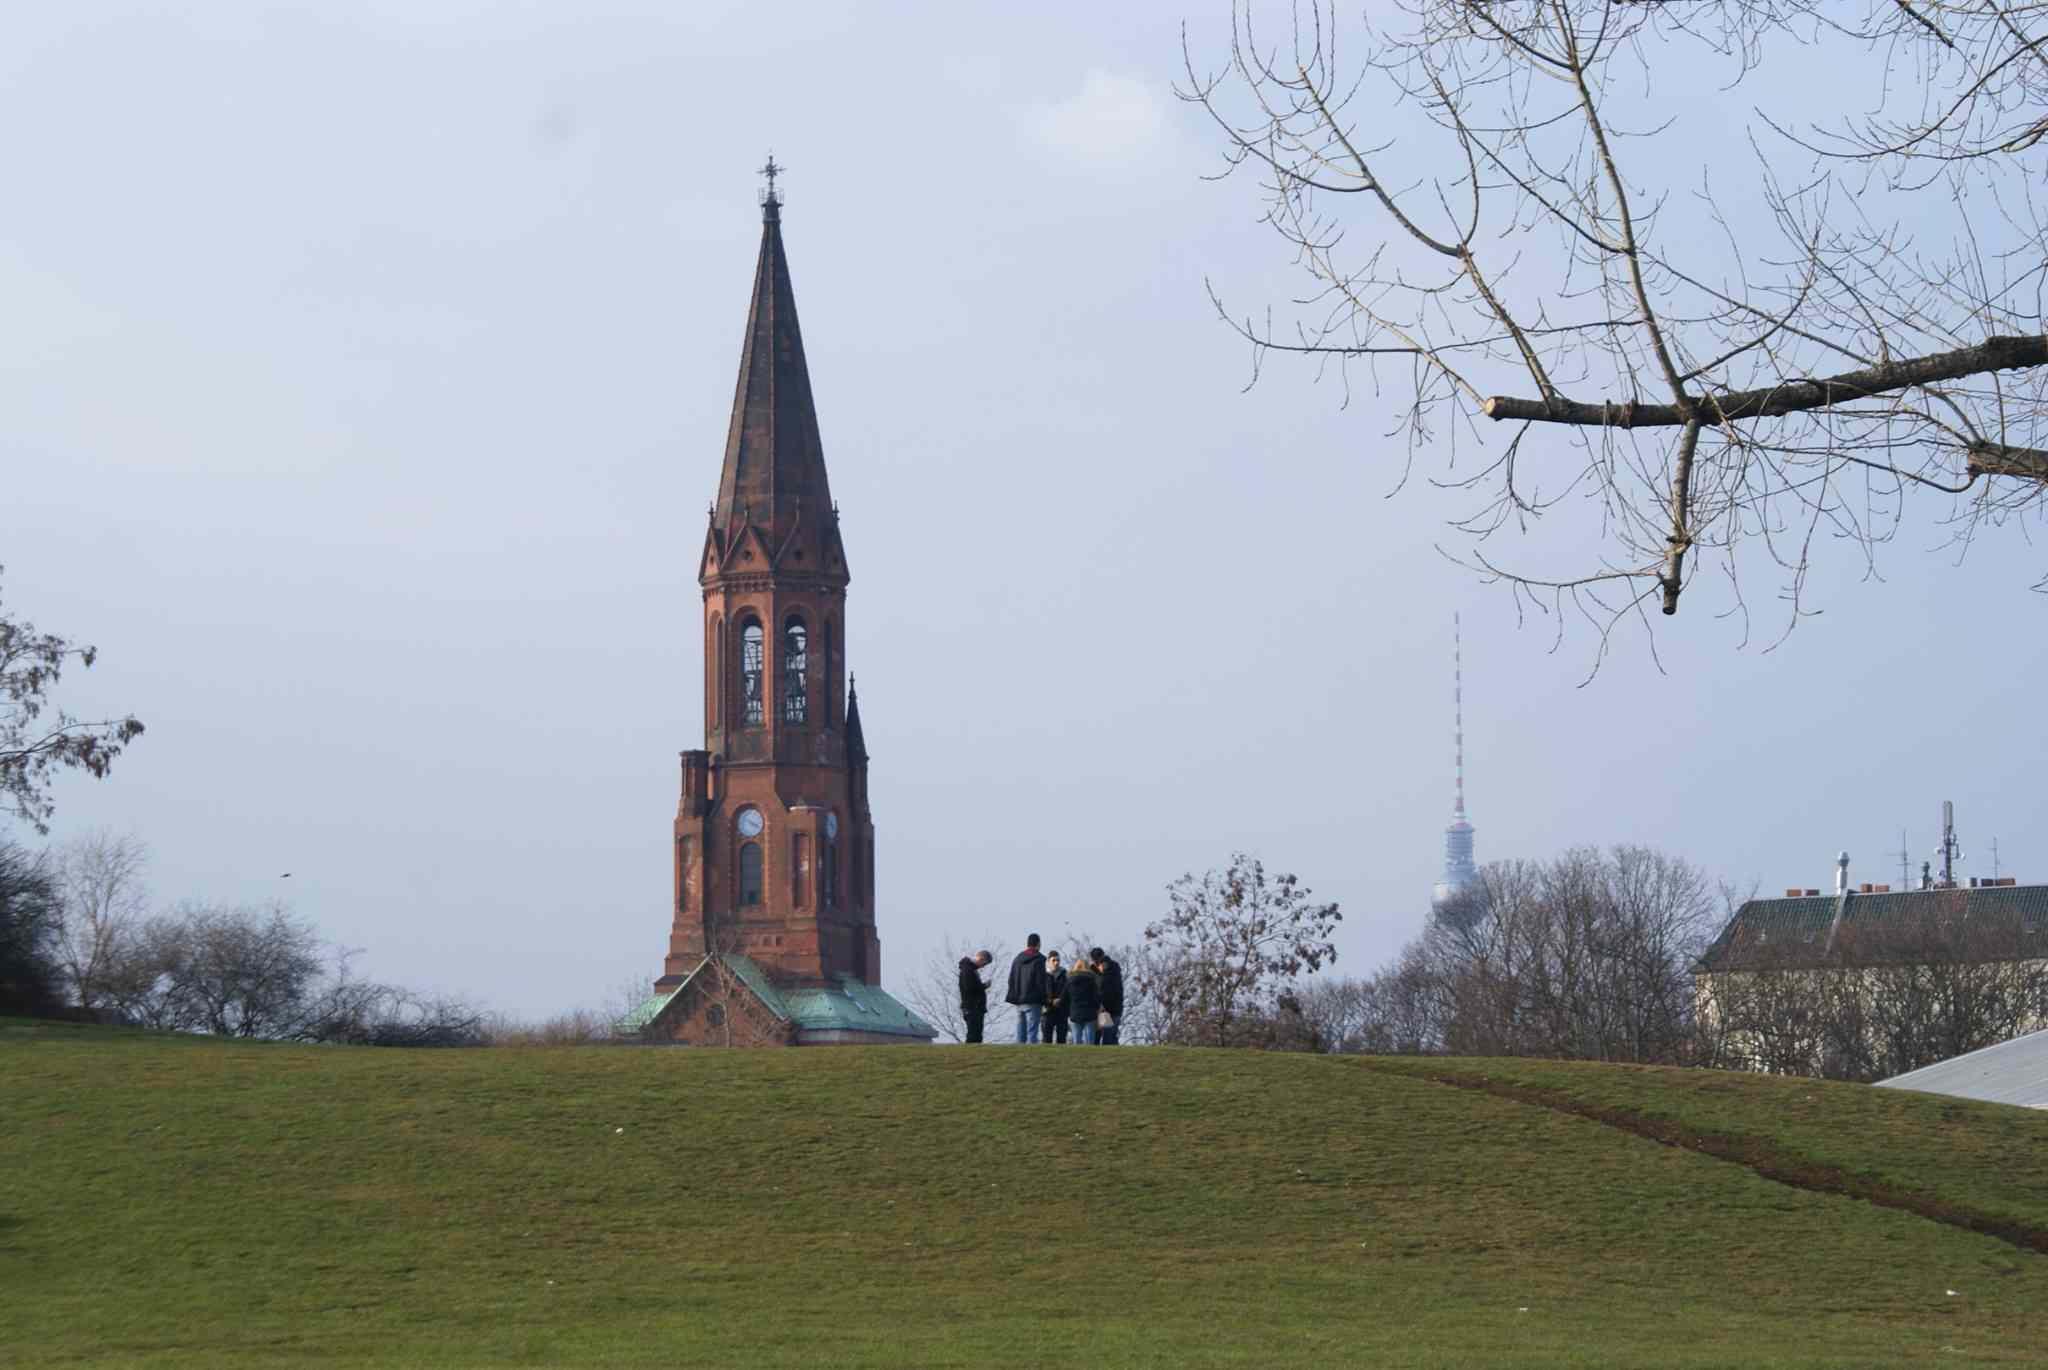 People standing on a hill in Görlitzer Park in Kreuzberg, Berlin